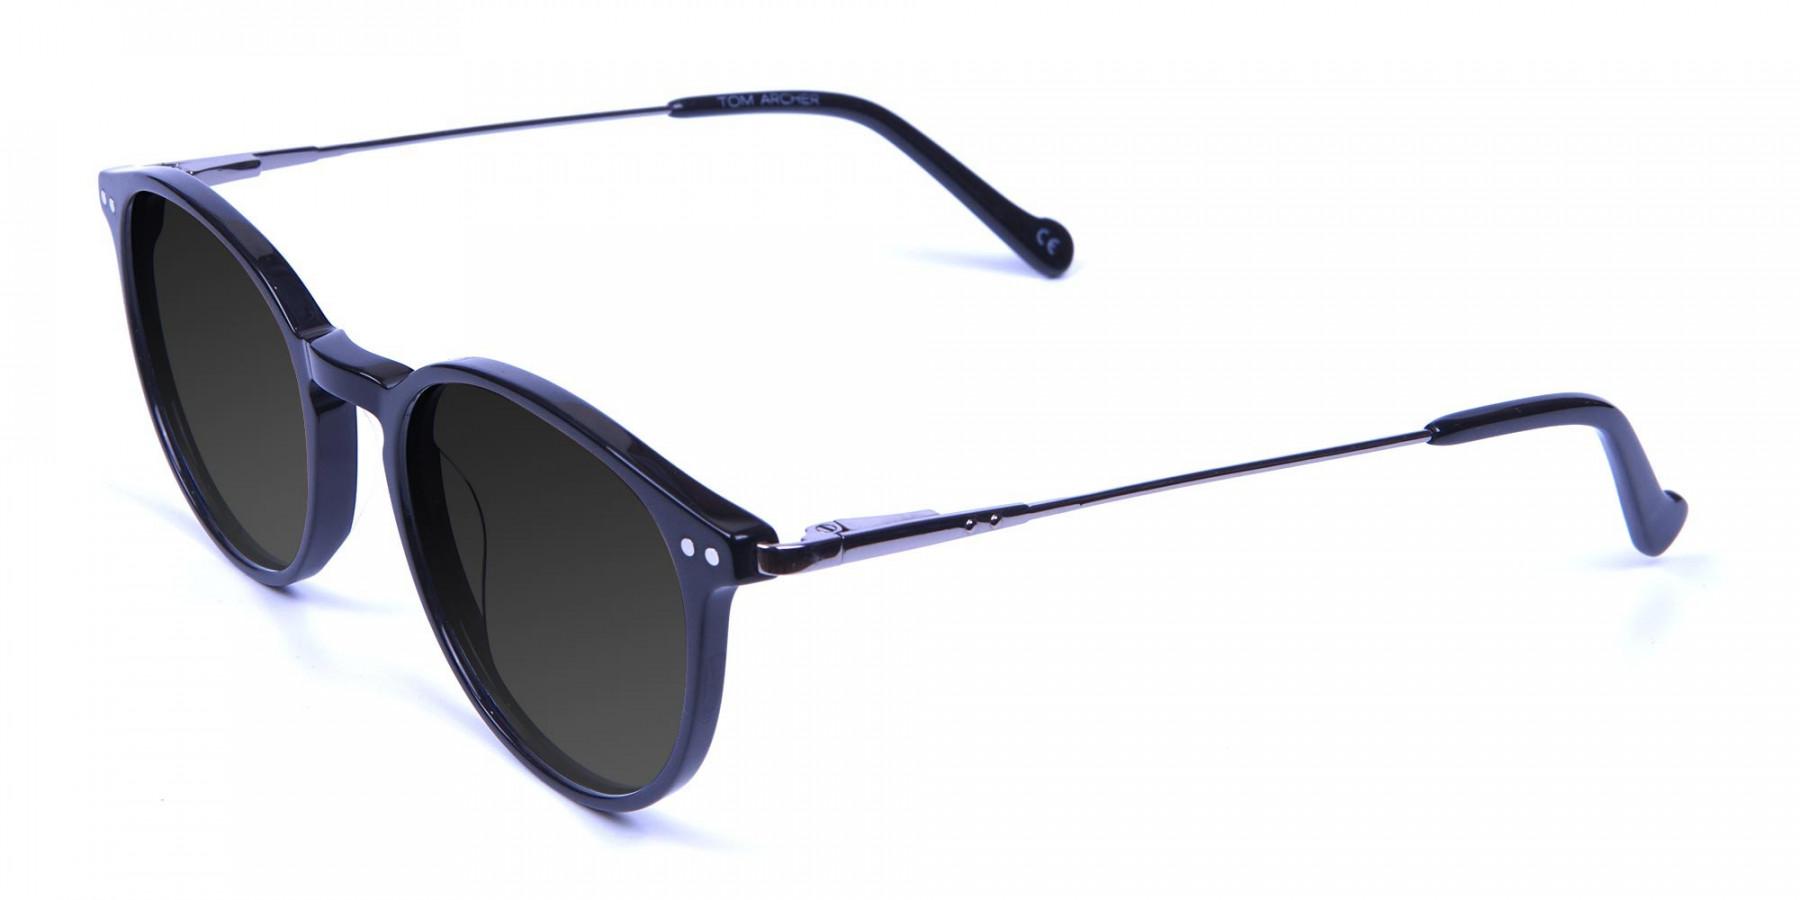 Dark Grey Sunglasses with Black Round Frame - 3